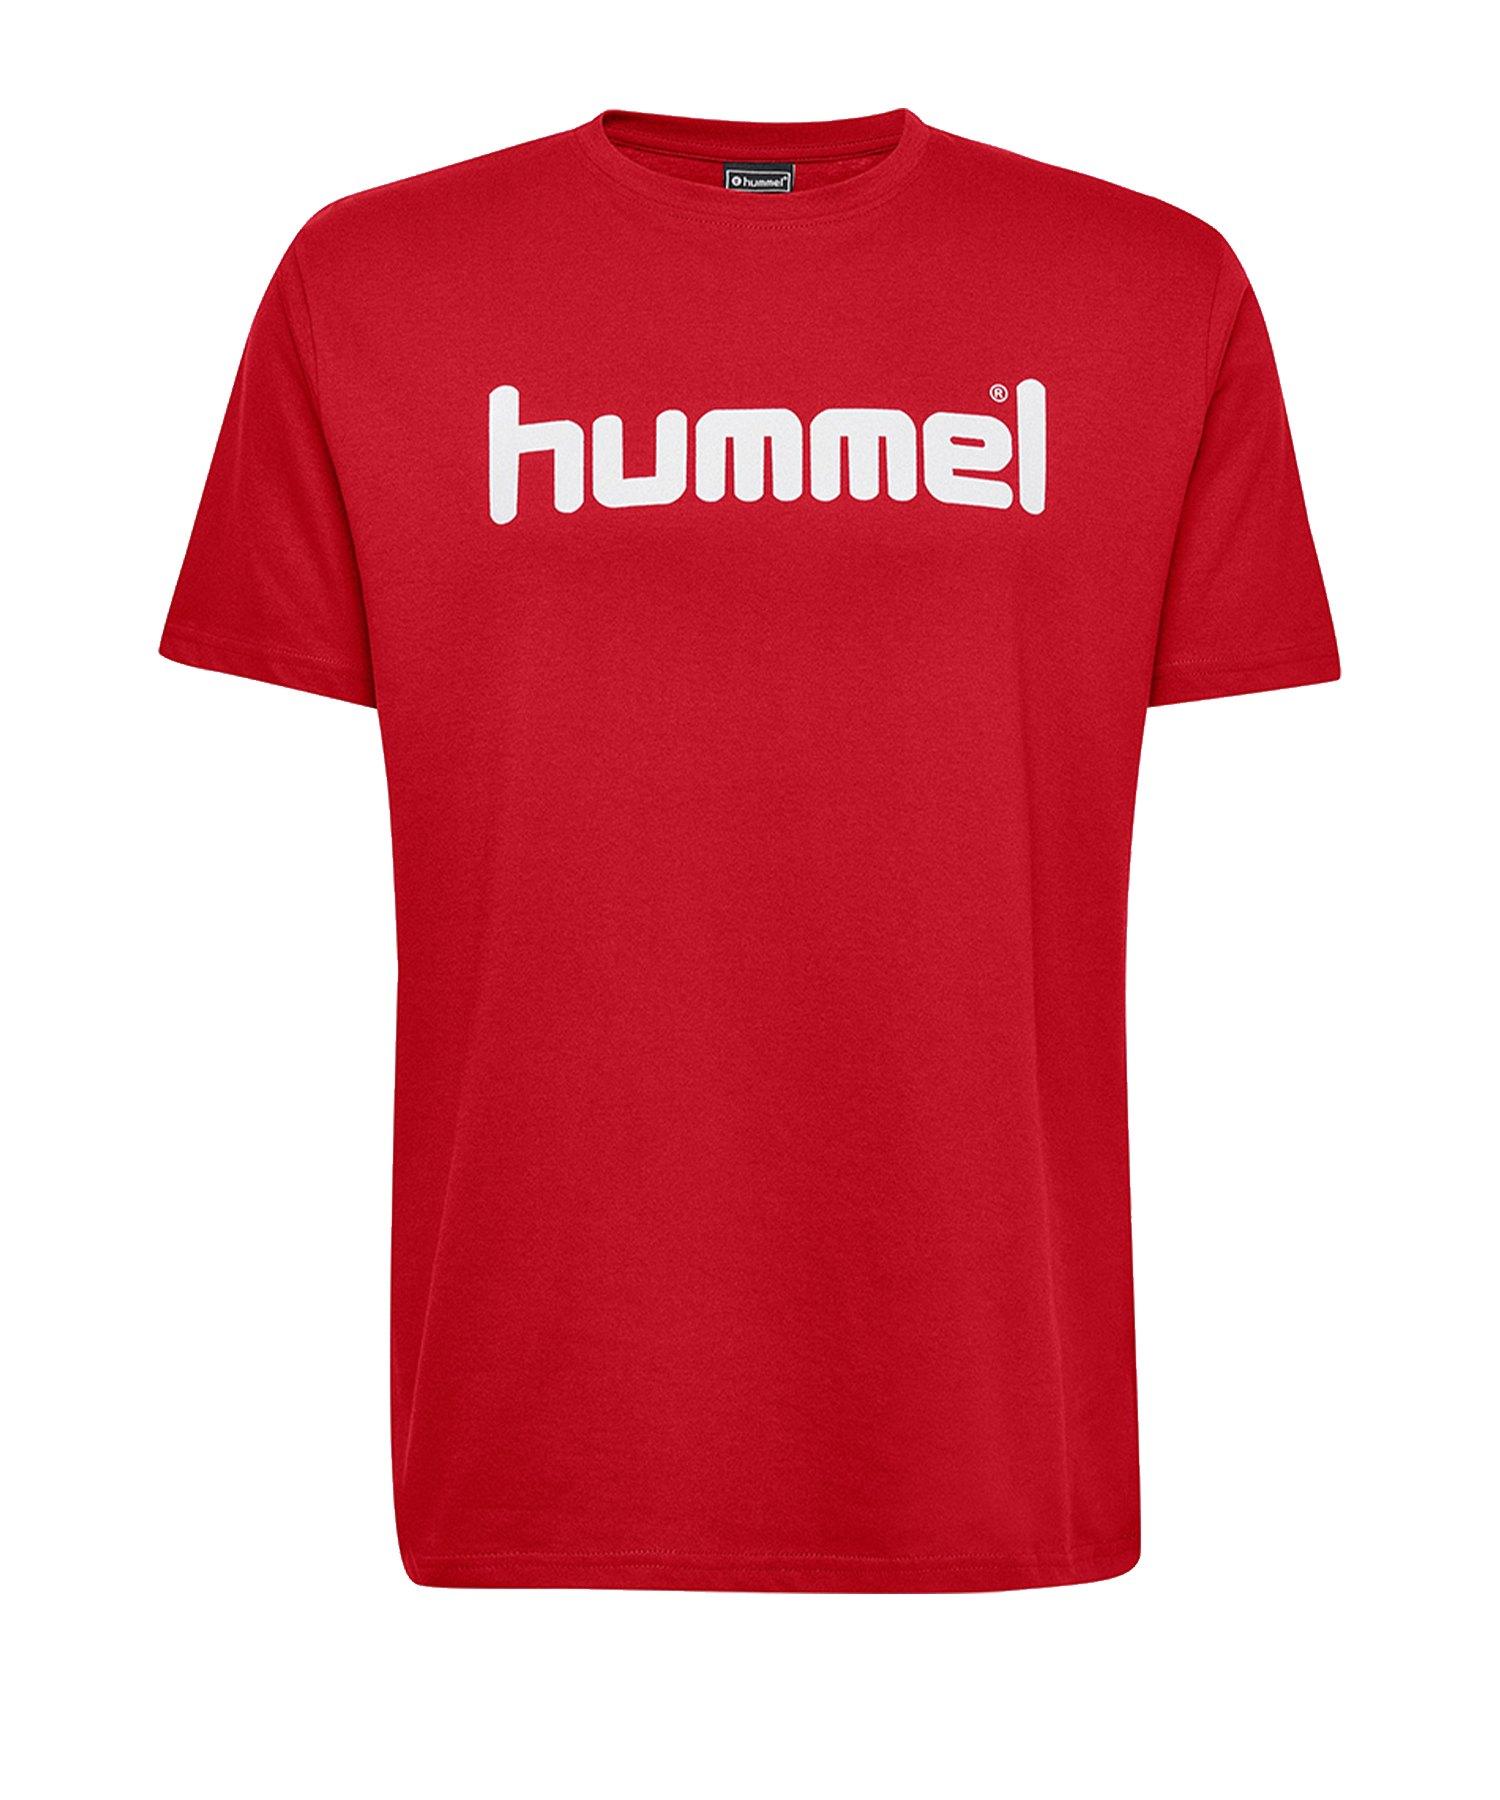 Hummel Cotton T-Shirt Logo Rot F3062 - Rot